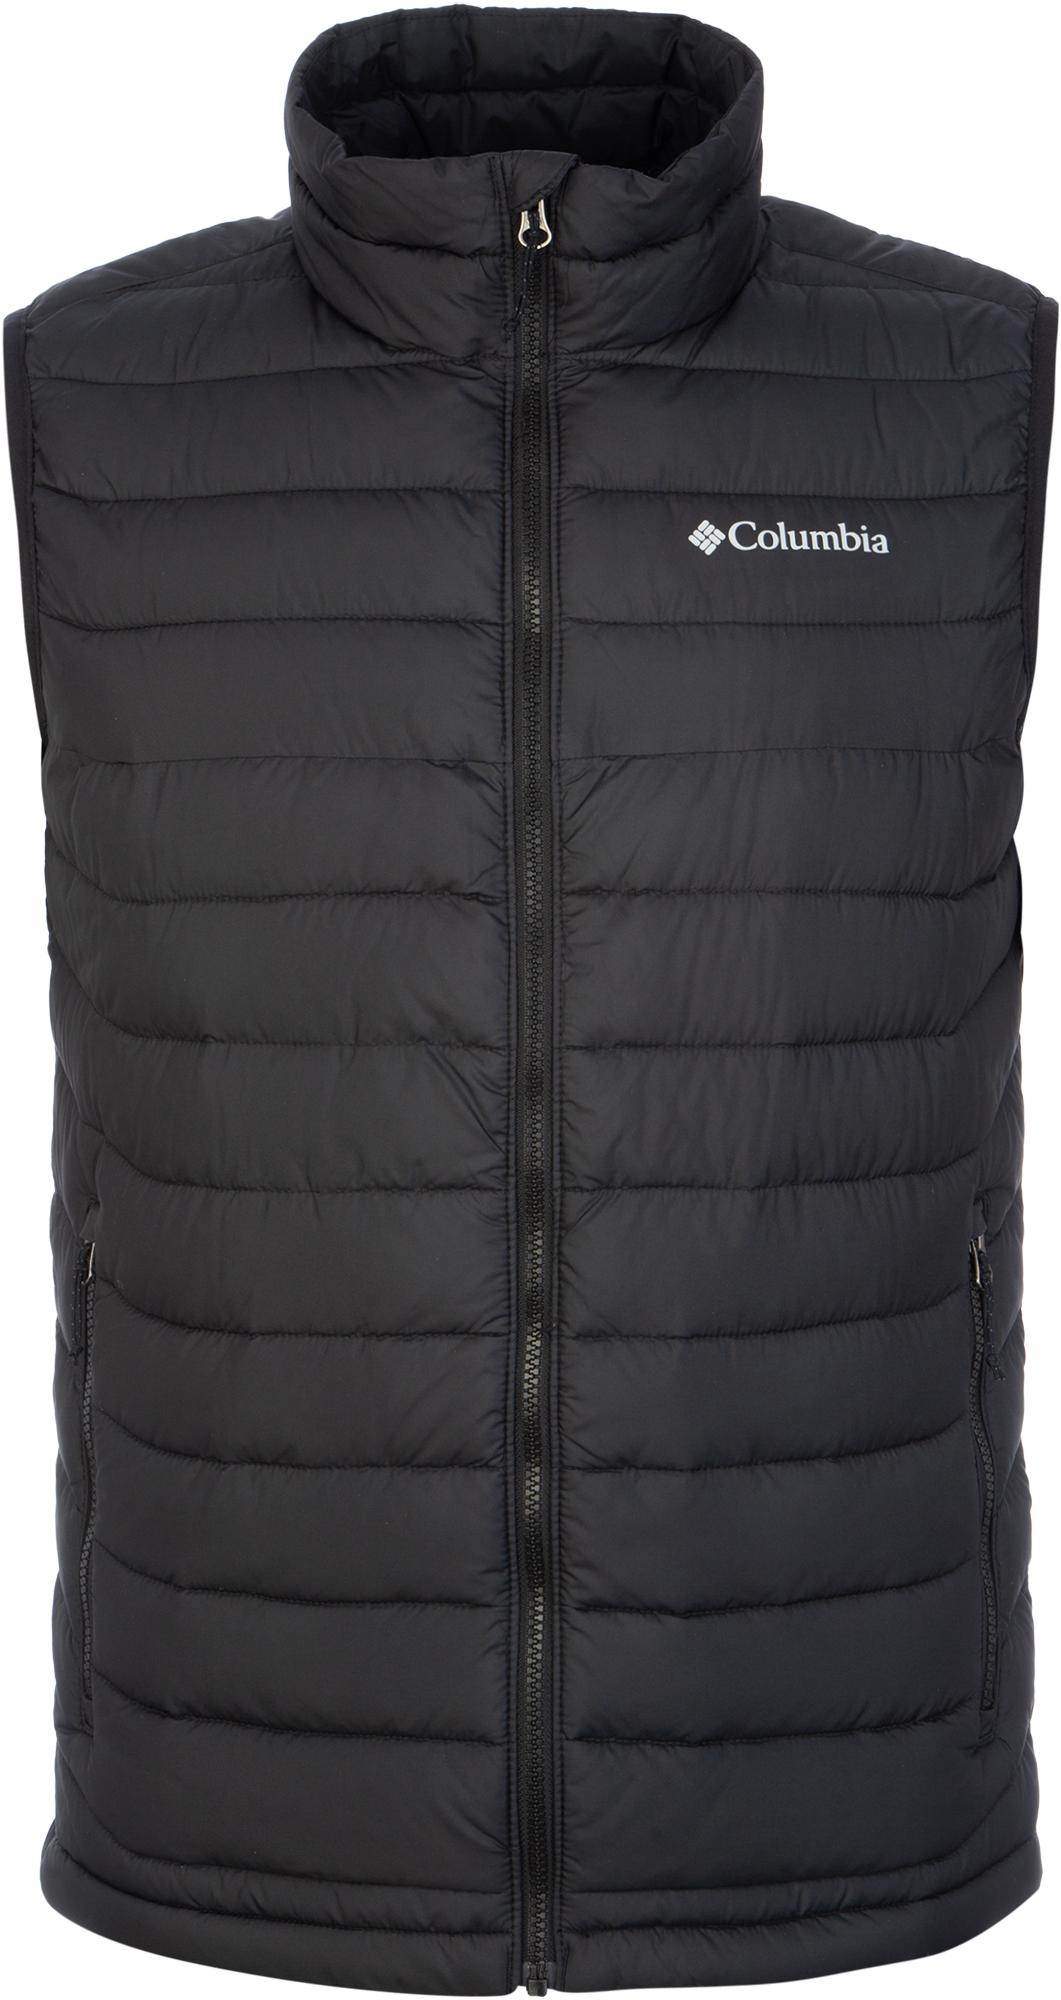 Columbia Жилет утепленный мужской Powder Lite, размер 56-58